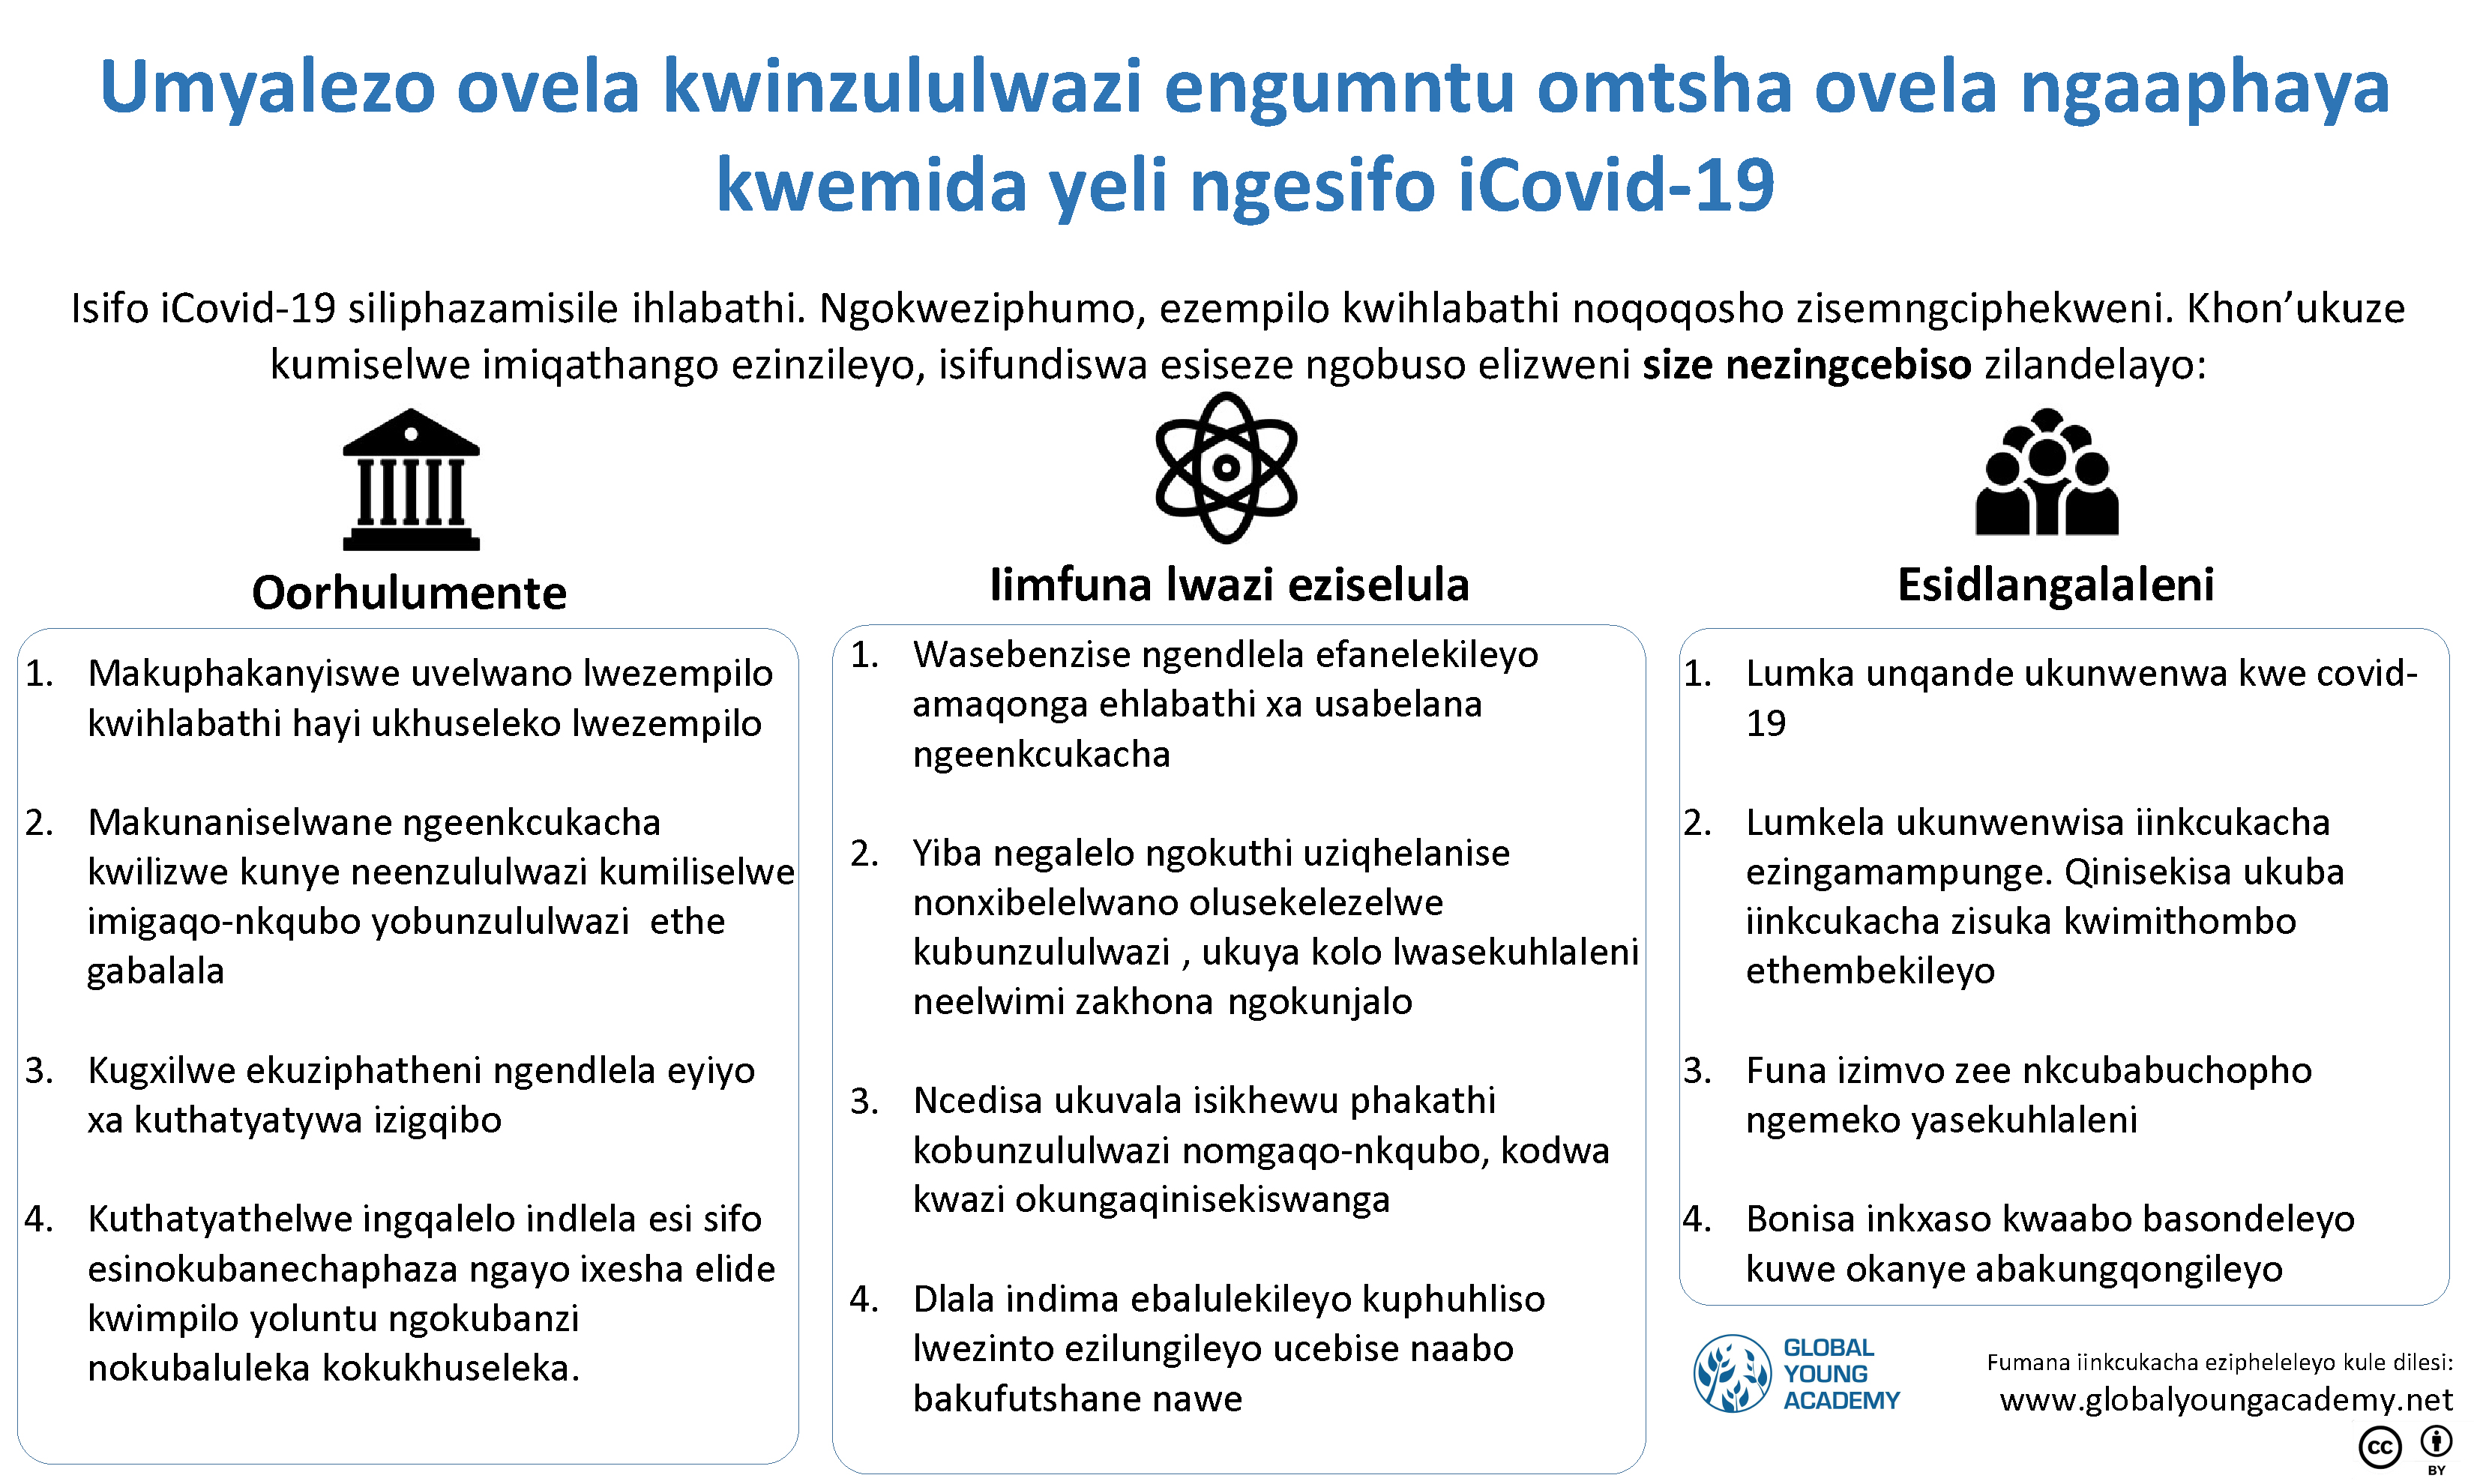 GYA COVID-19 statement infographic - Xhosa version